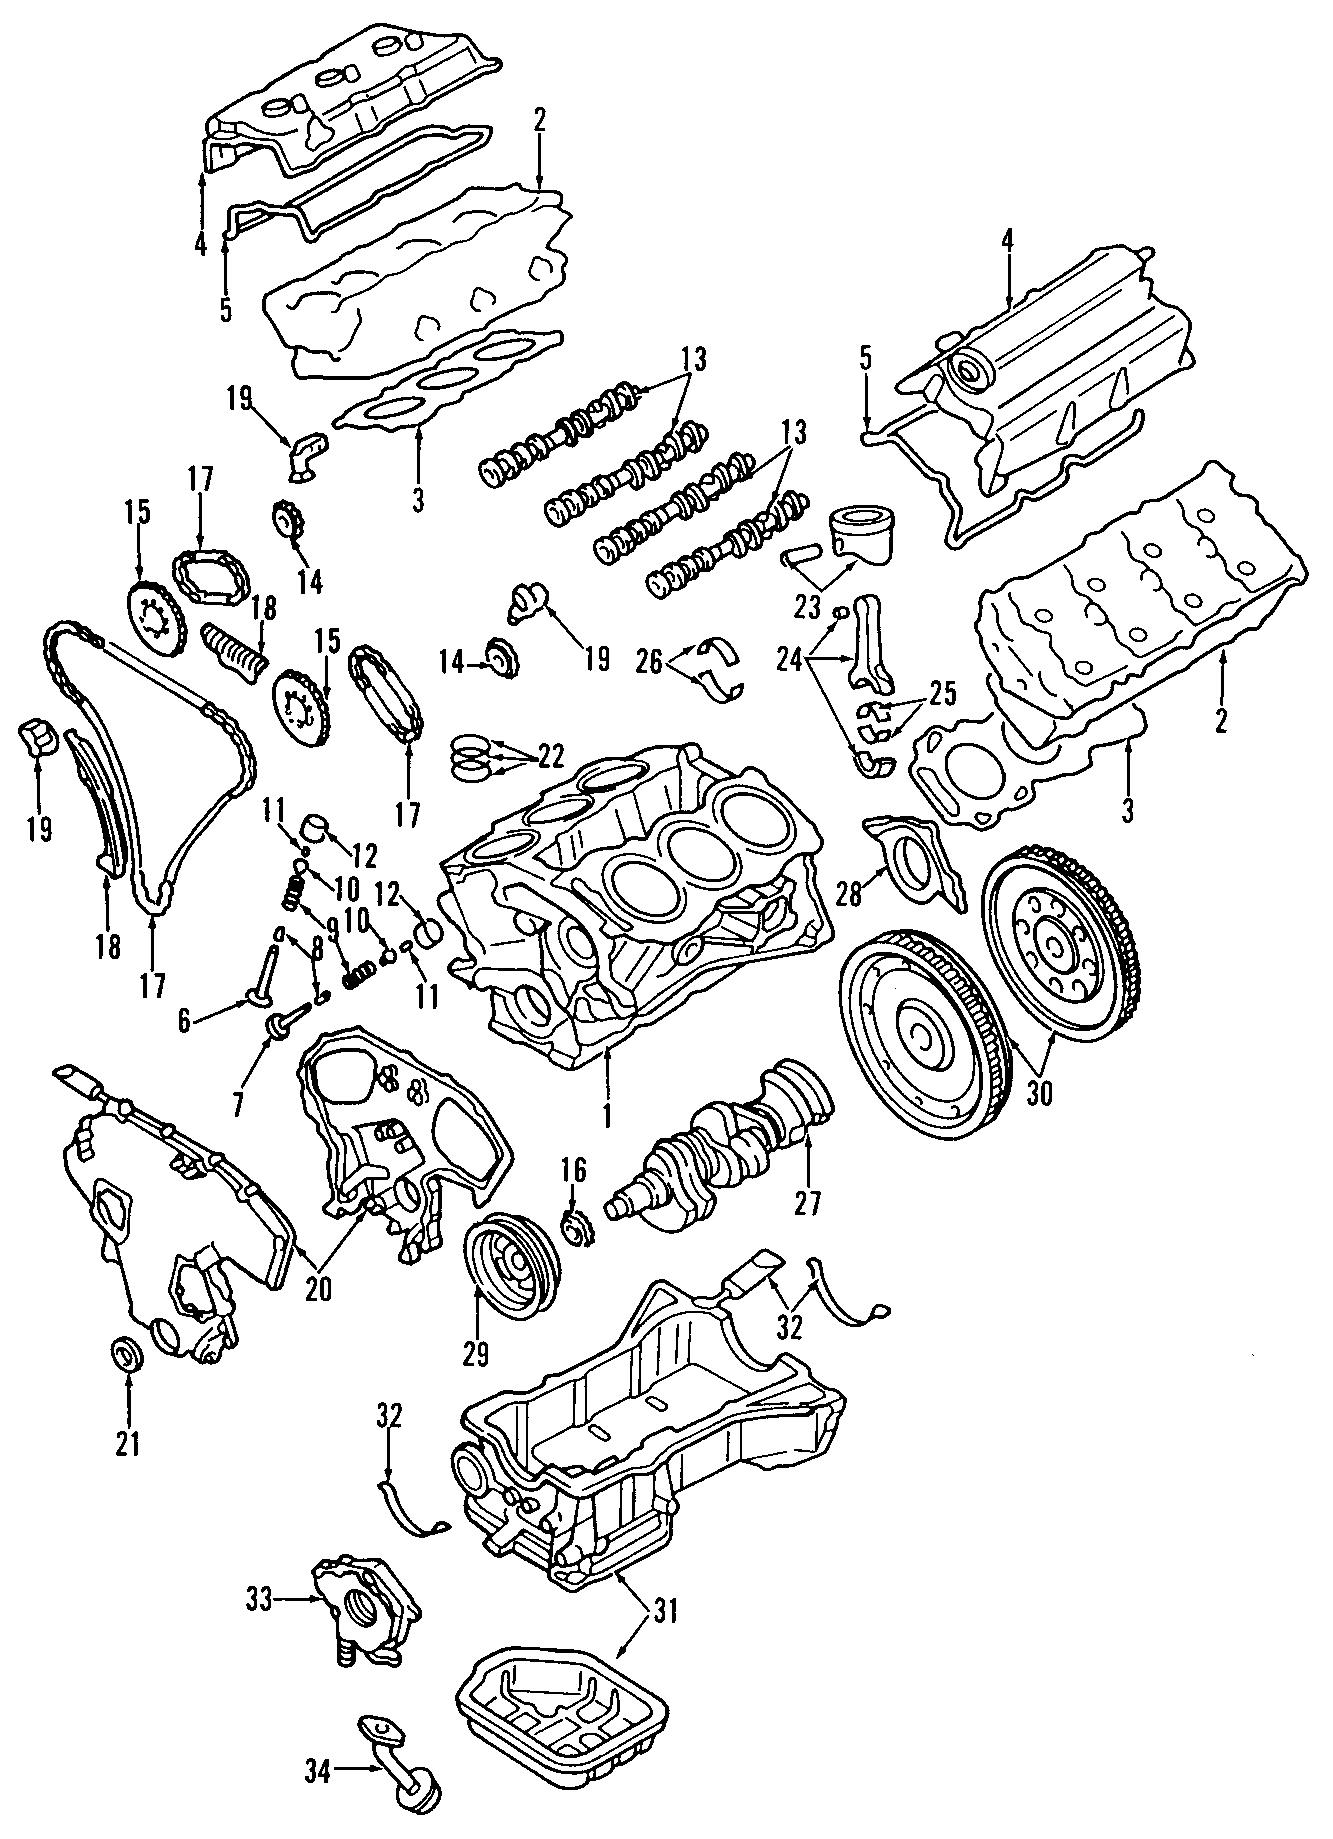 Nissan Altima Engine Camshaft Follower Lifter